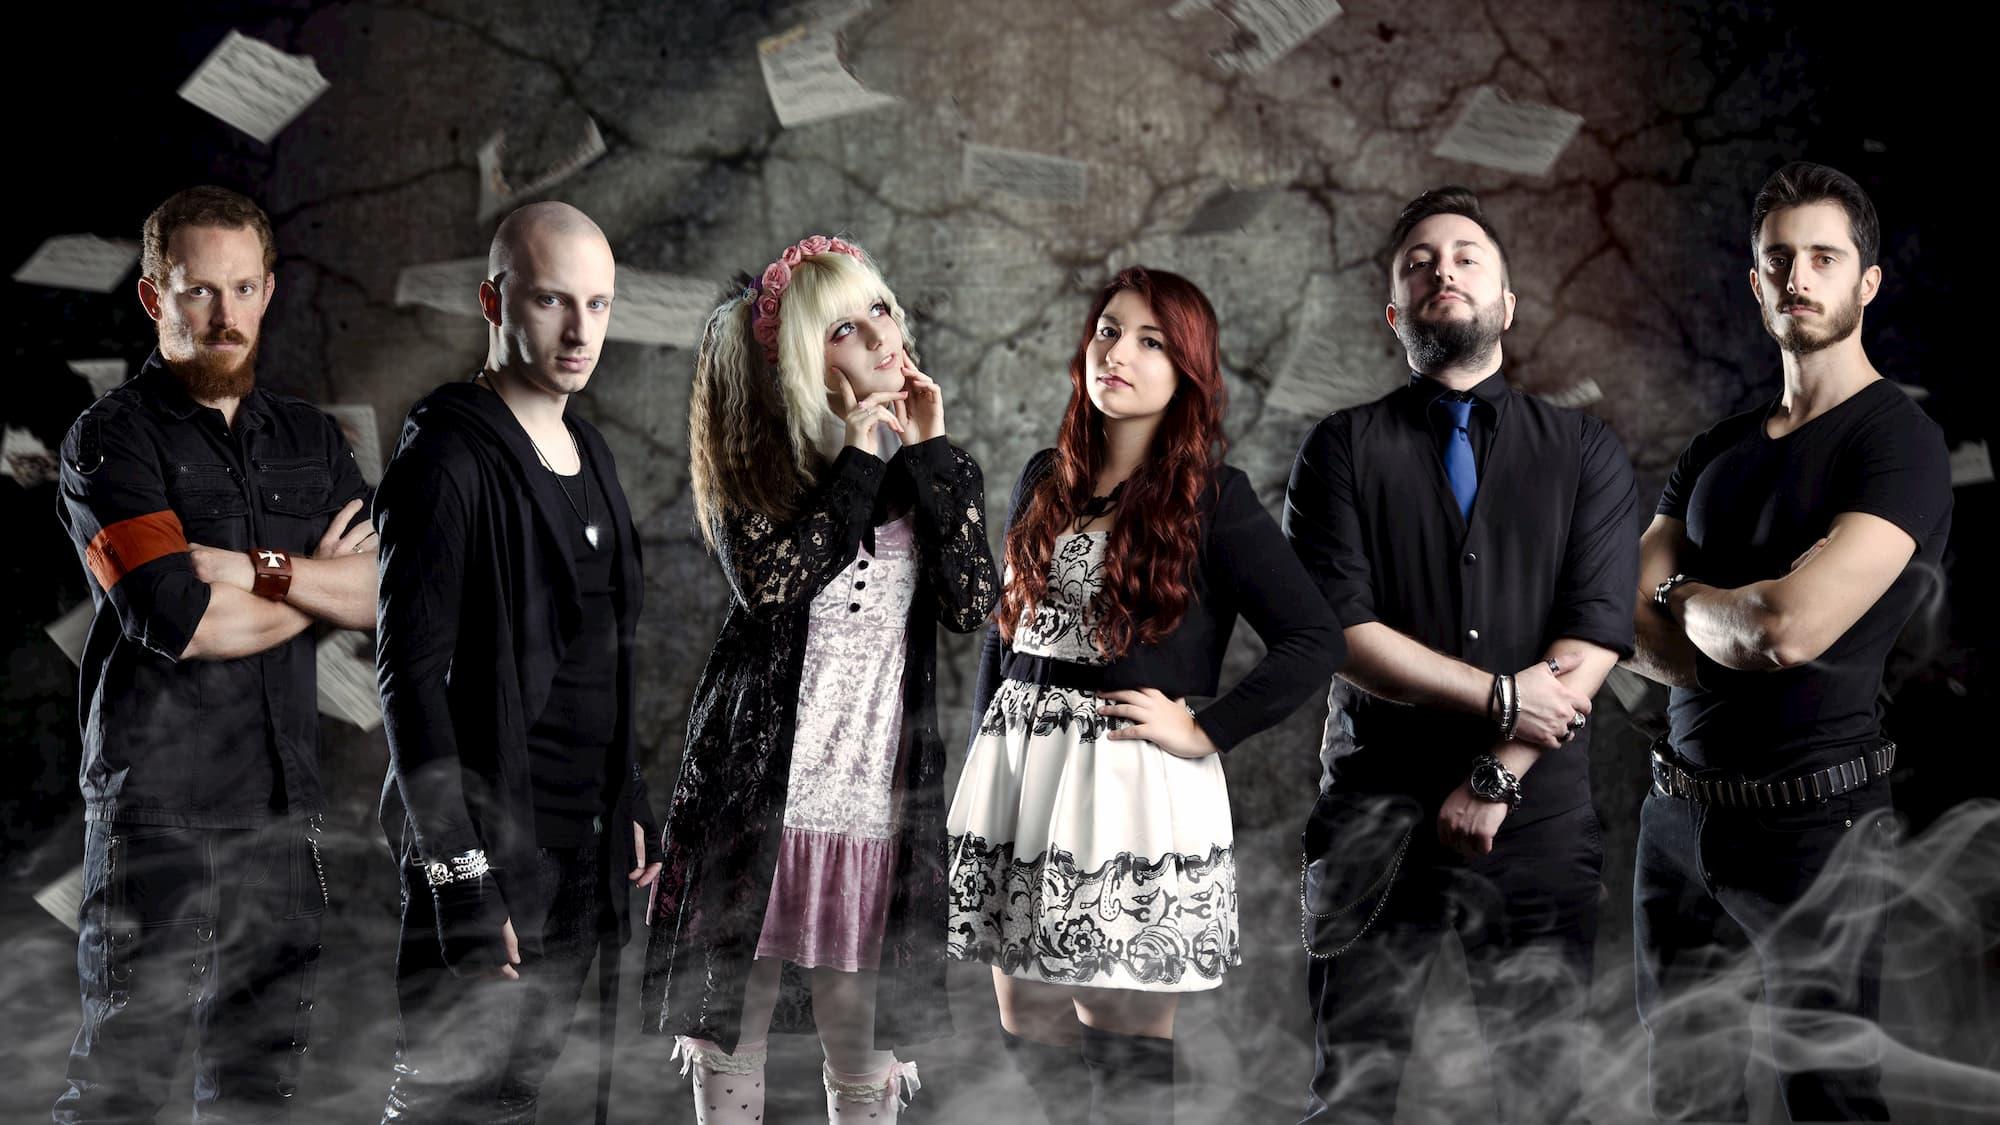 immagine coordinata cover di facebook band metal